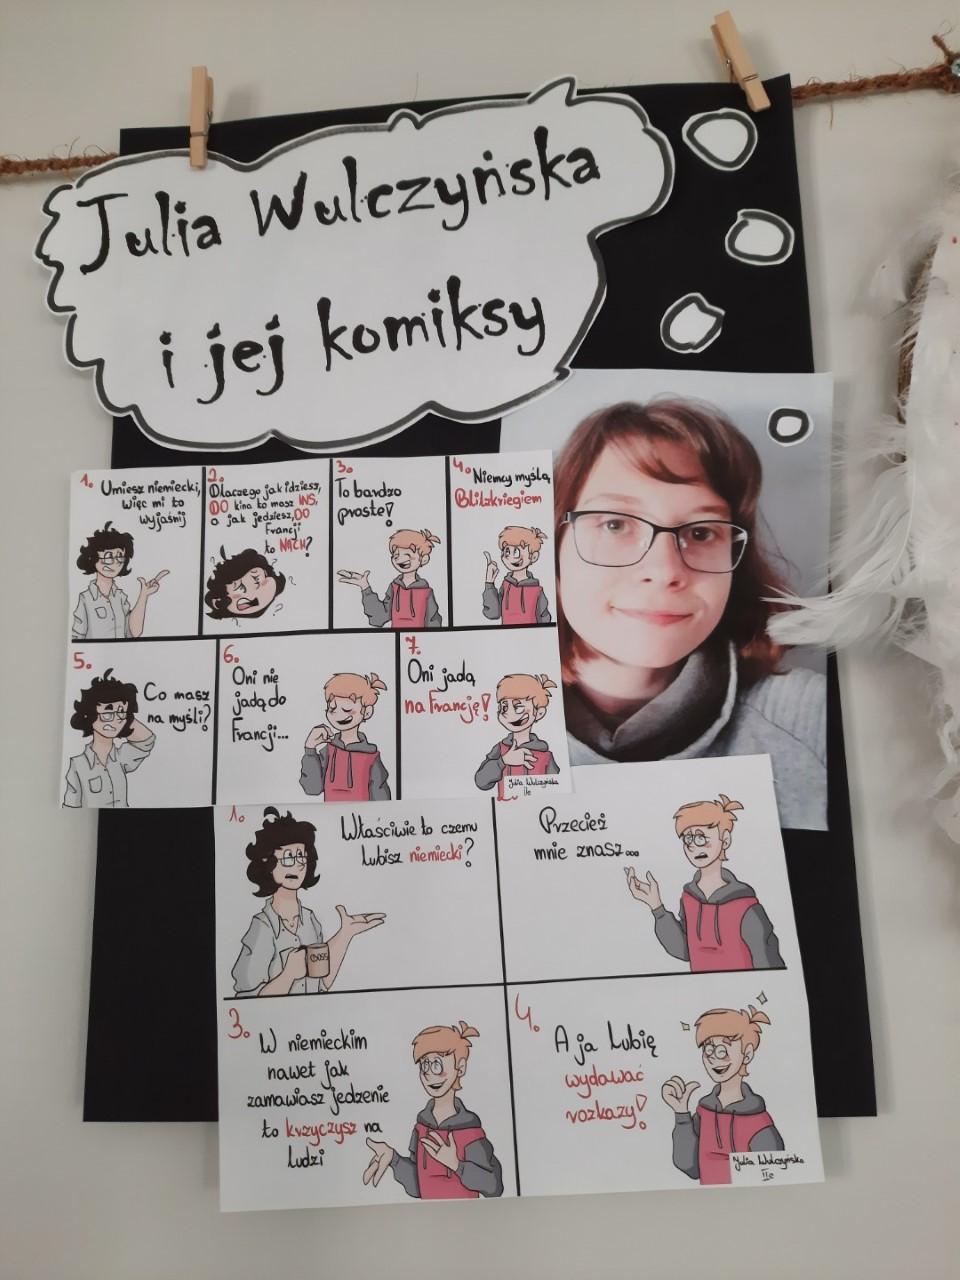 Julia-Wulczynska